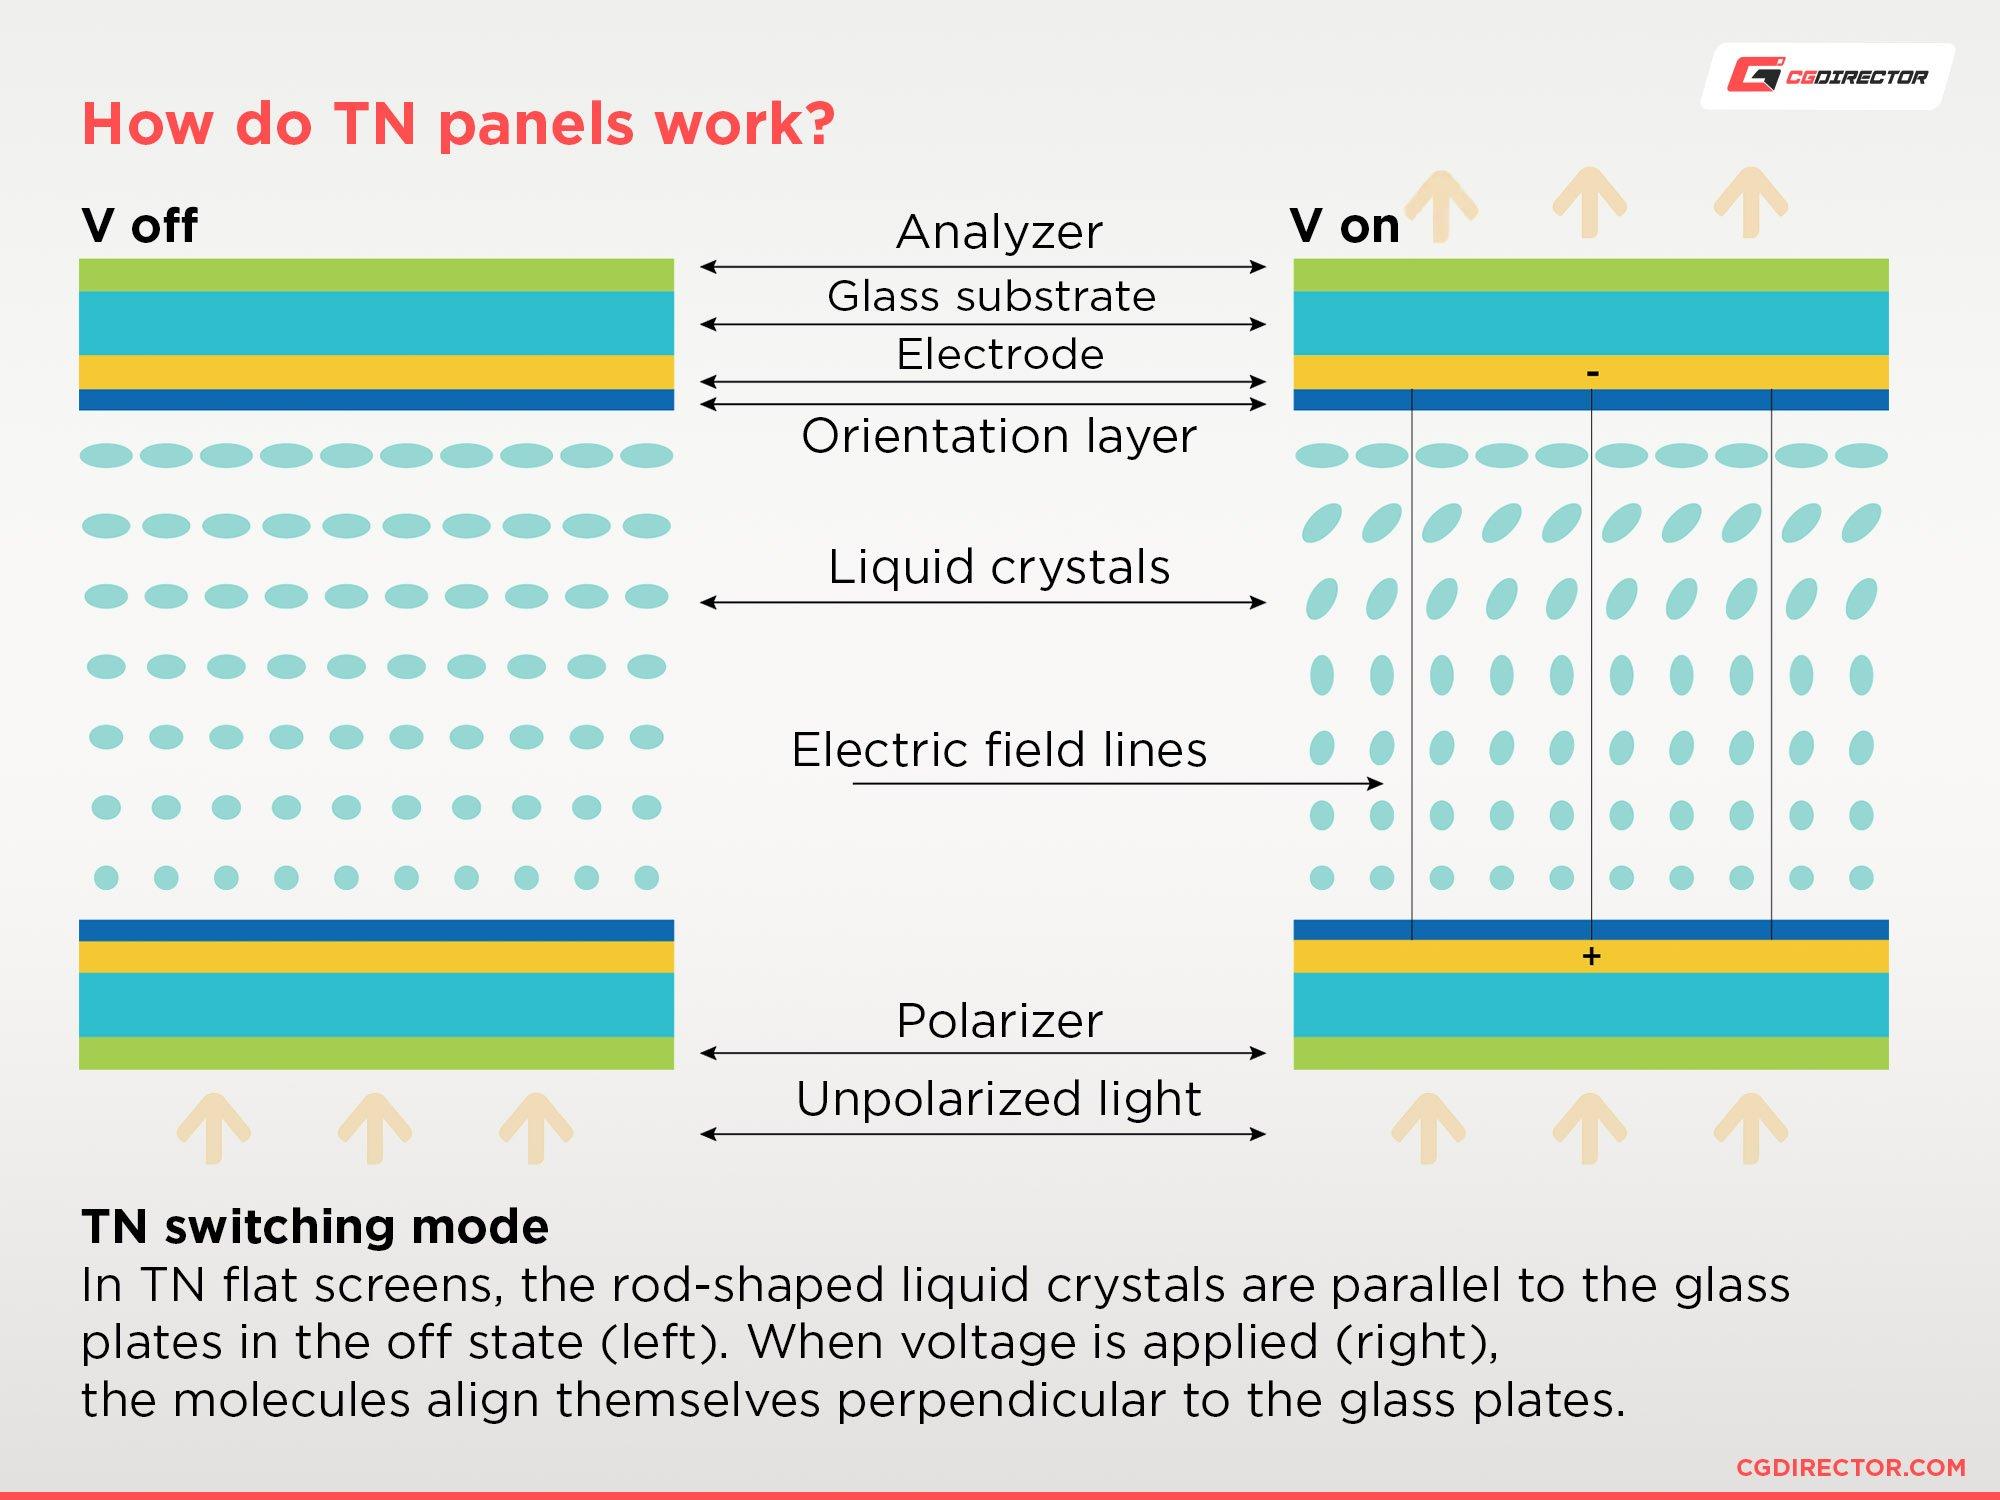 How do TN Panels work